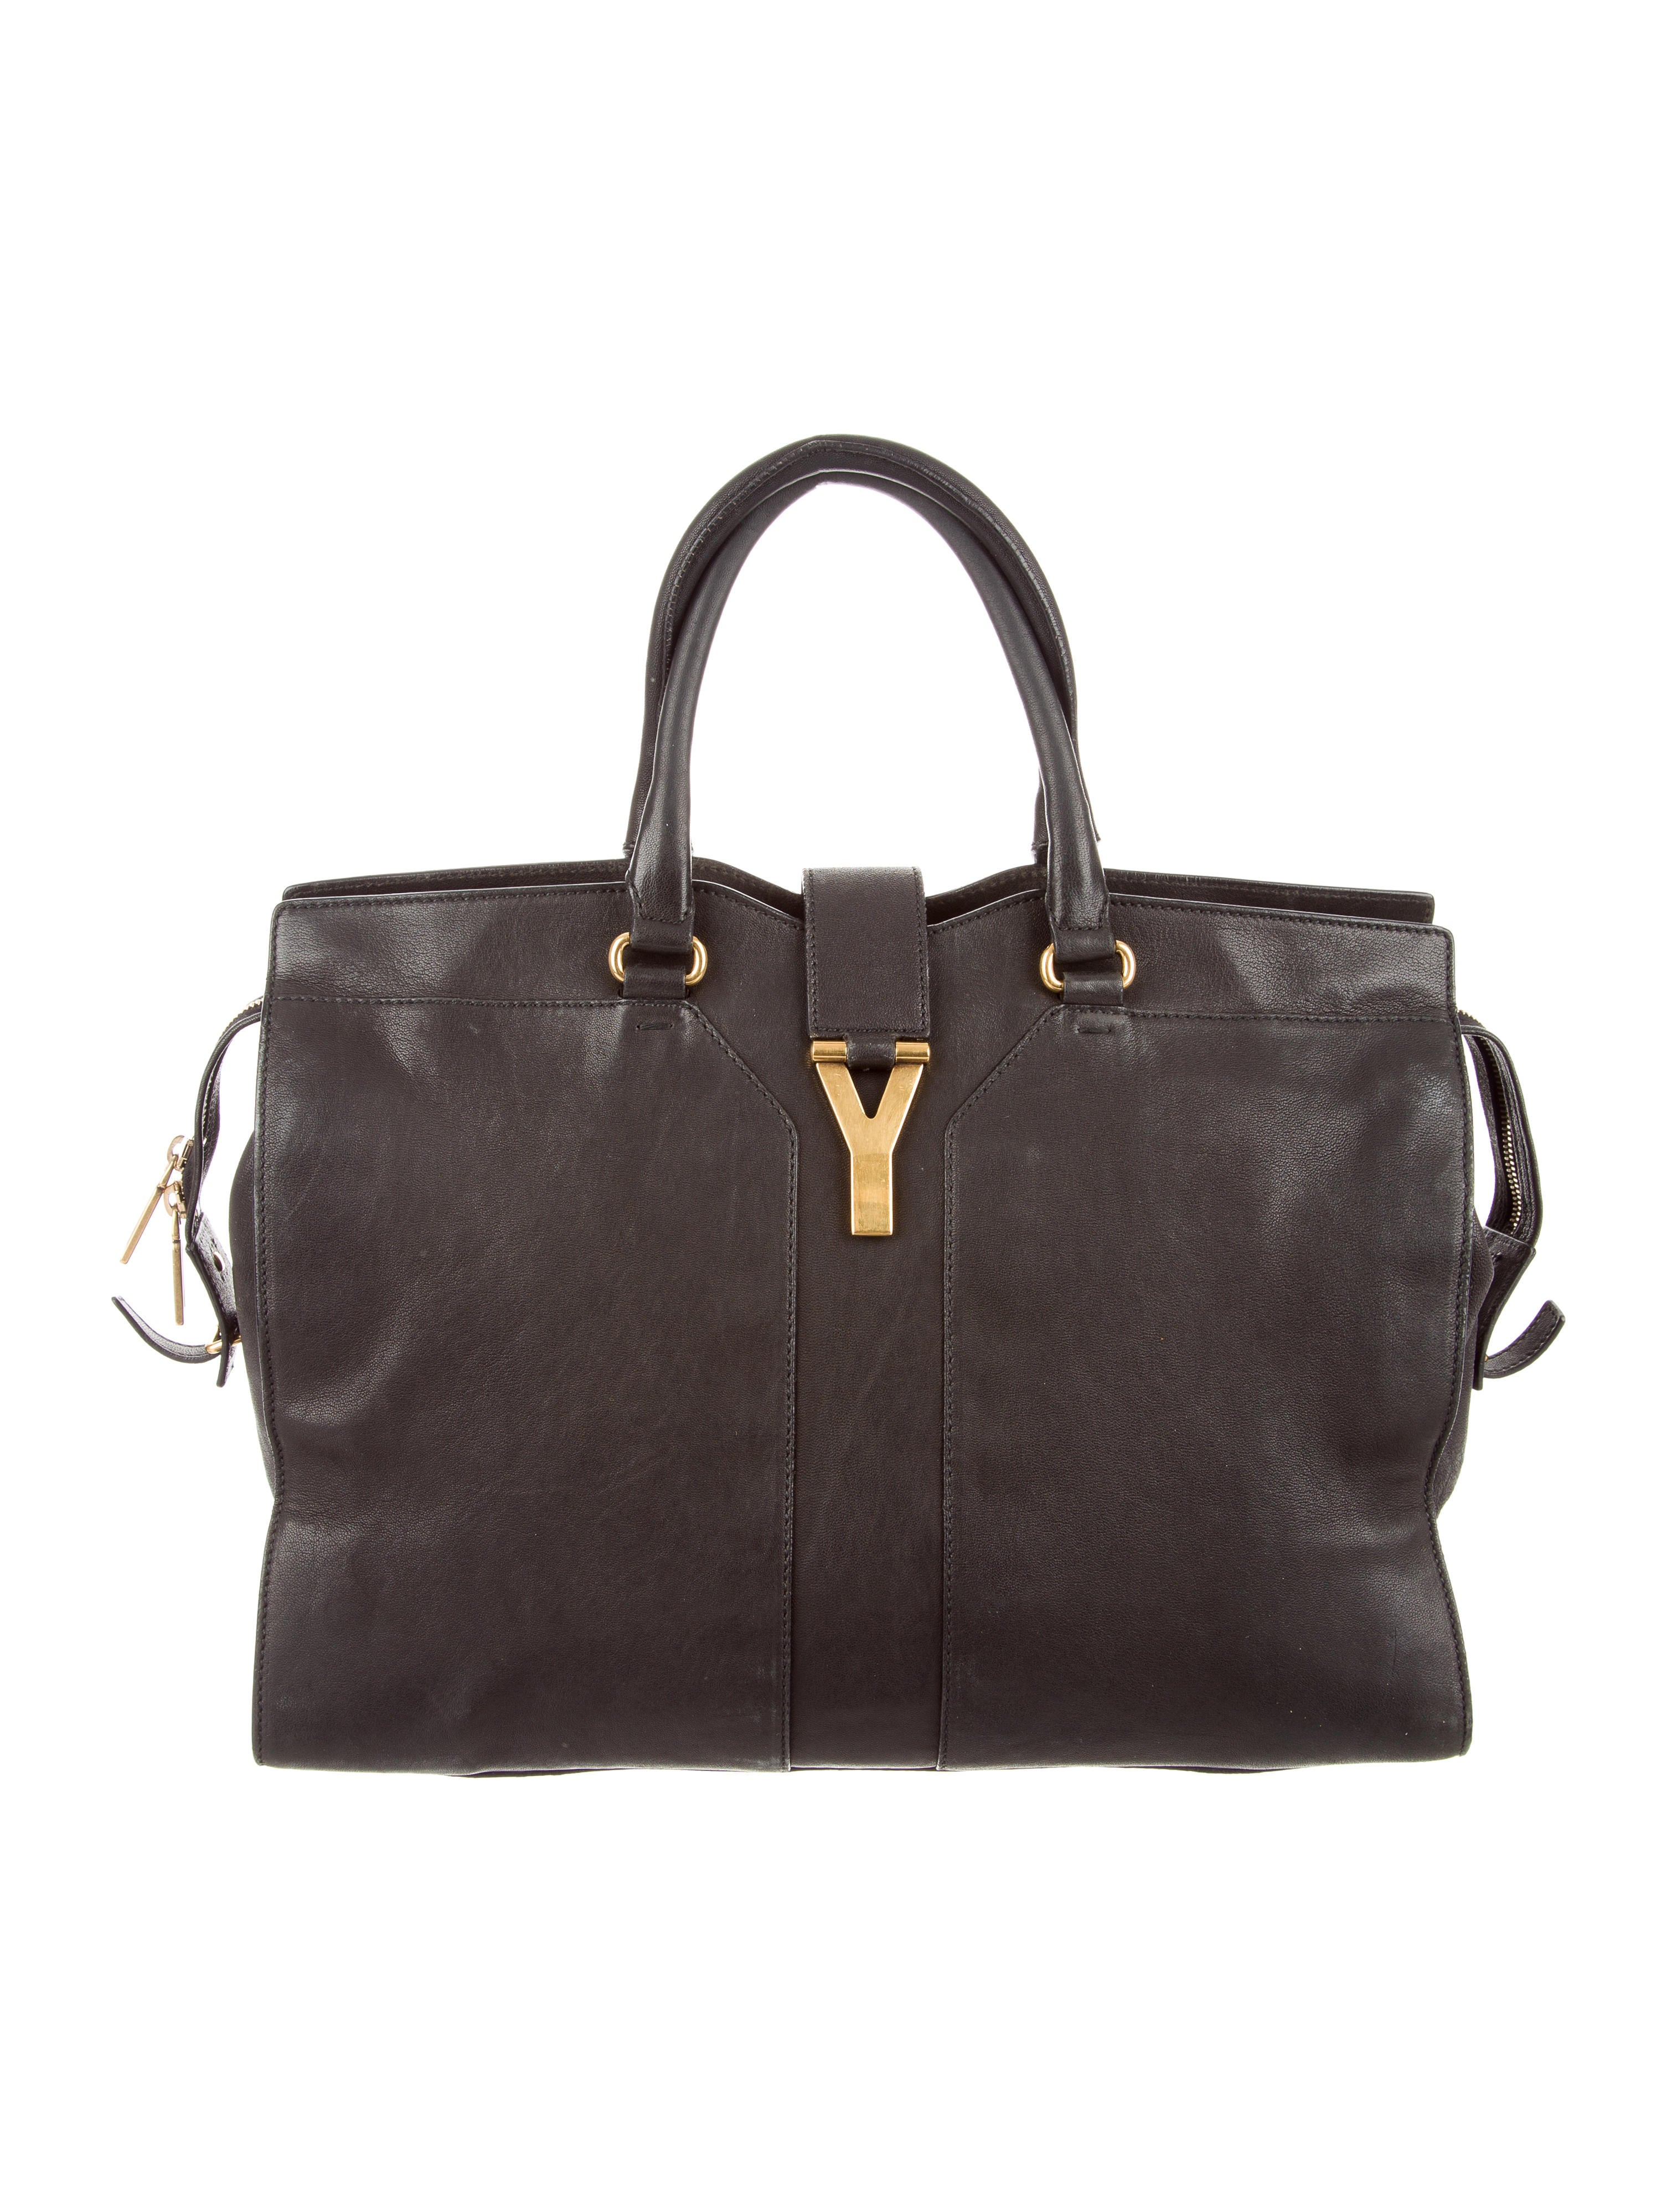 Yves Saint Laurent Cabas Chyc Bag Handbags Yve61809